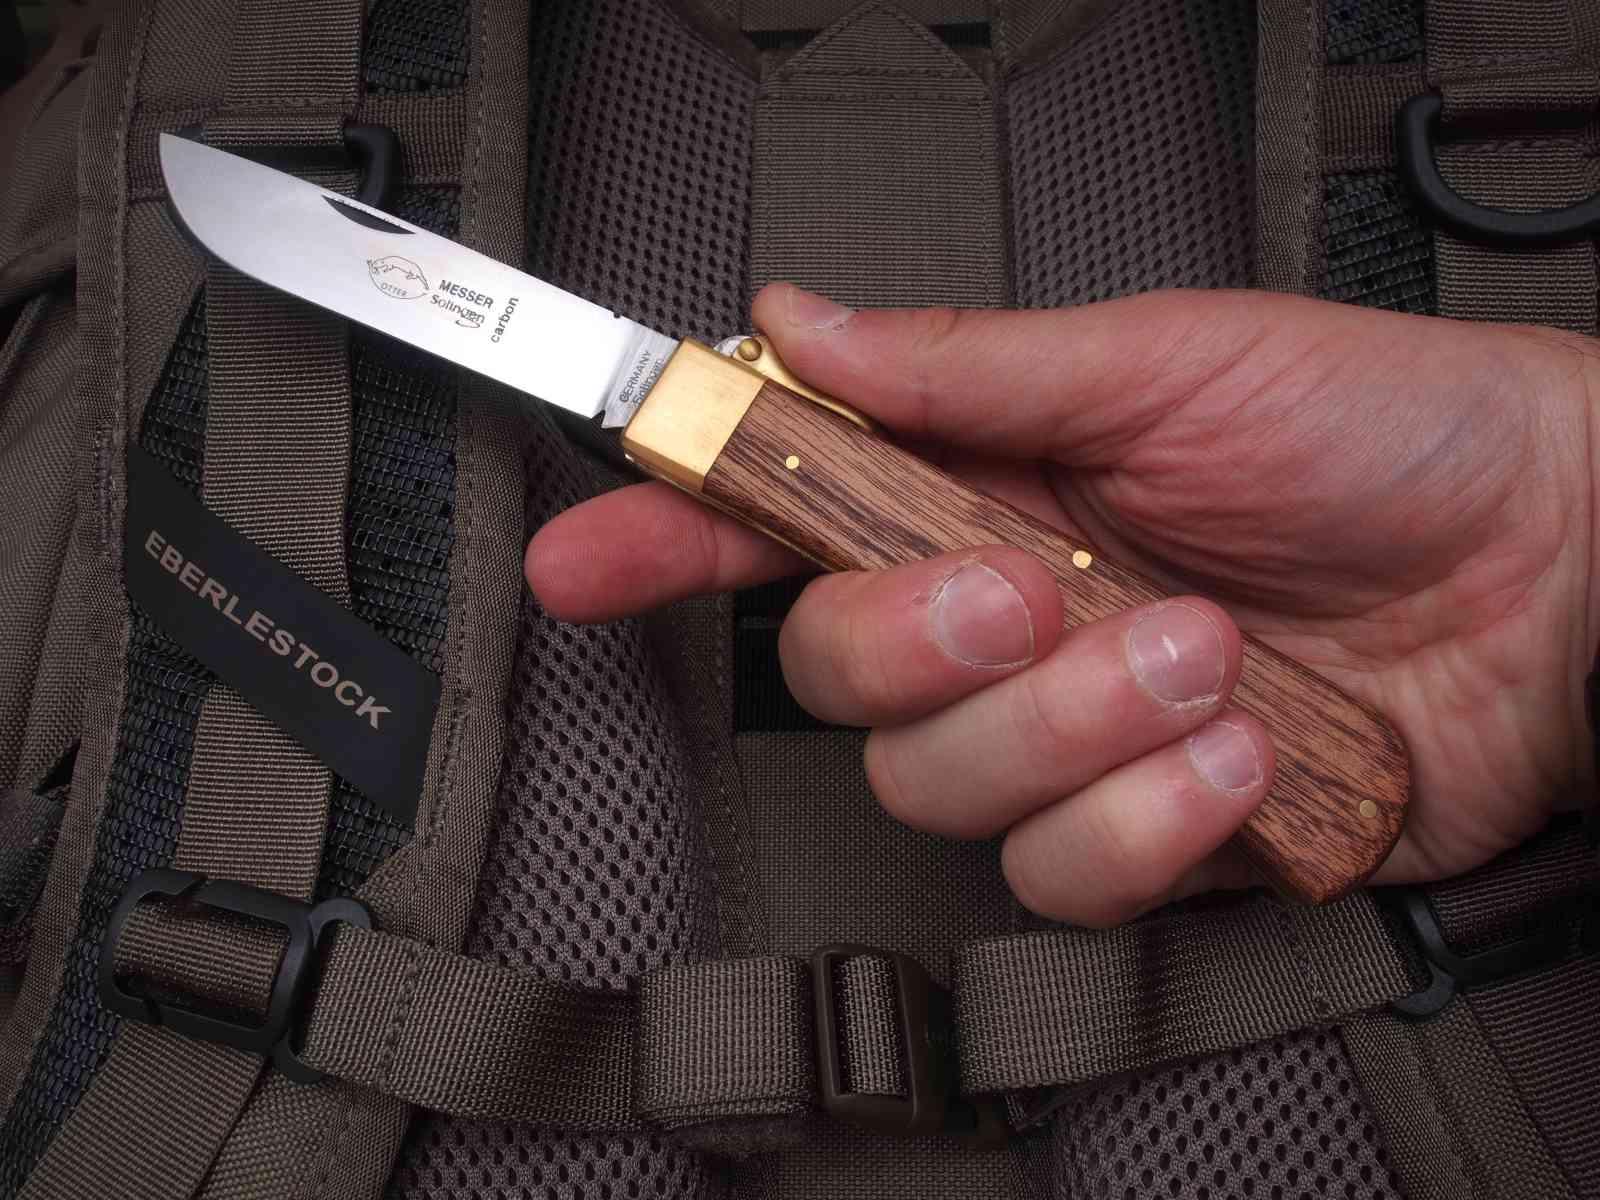 Otter Klappbügel-Messer - Handlage